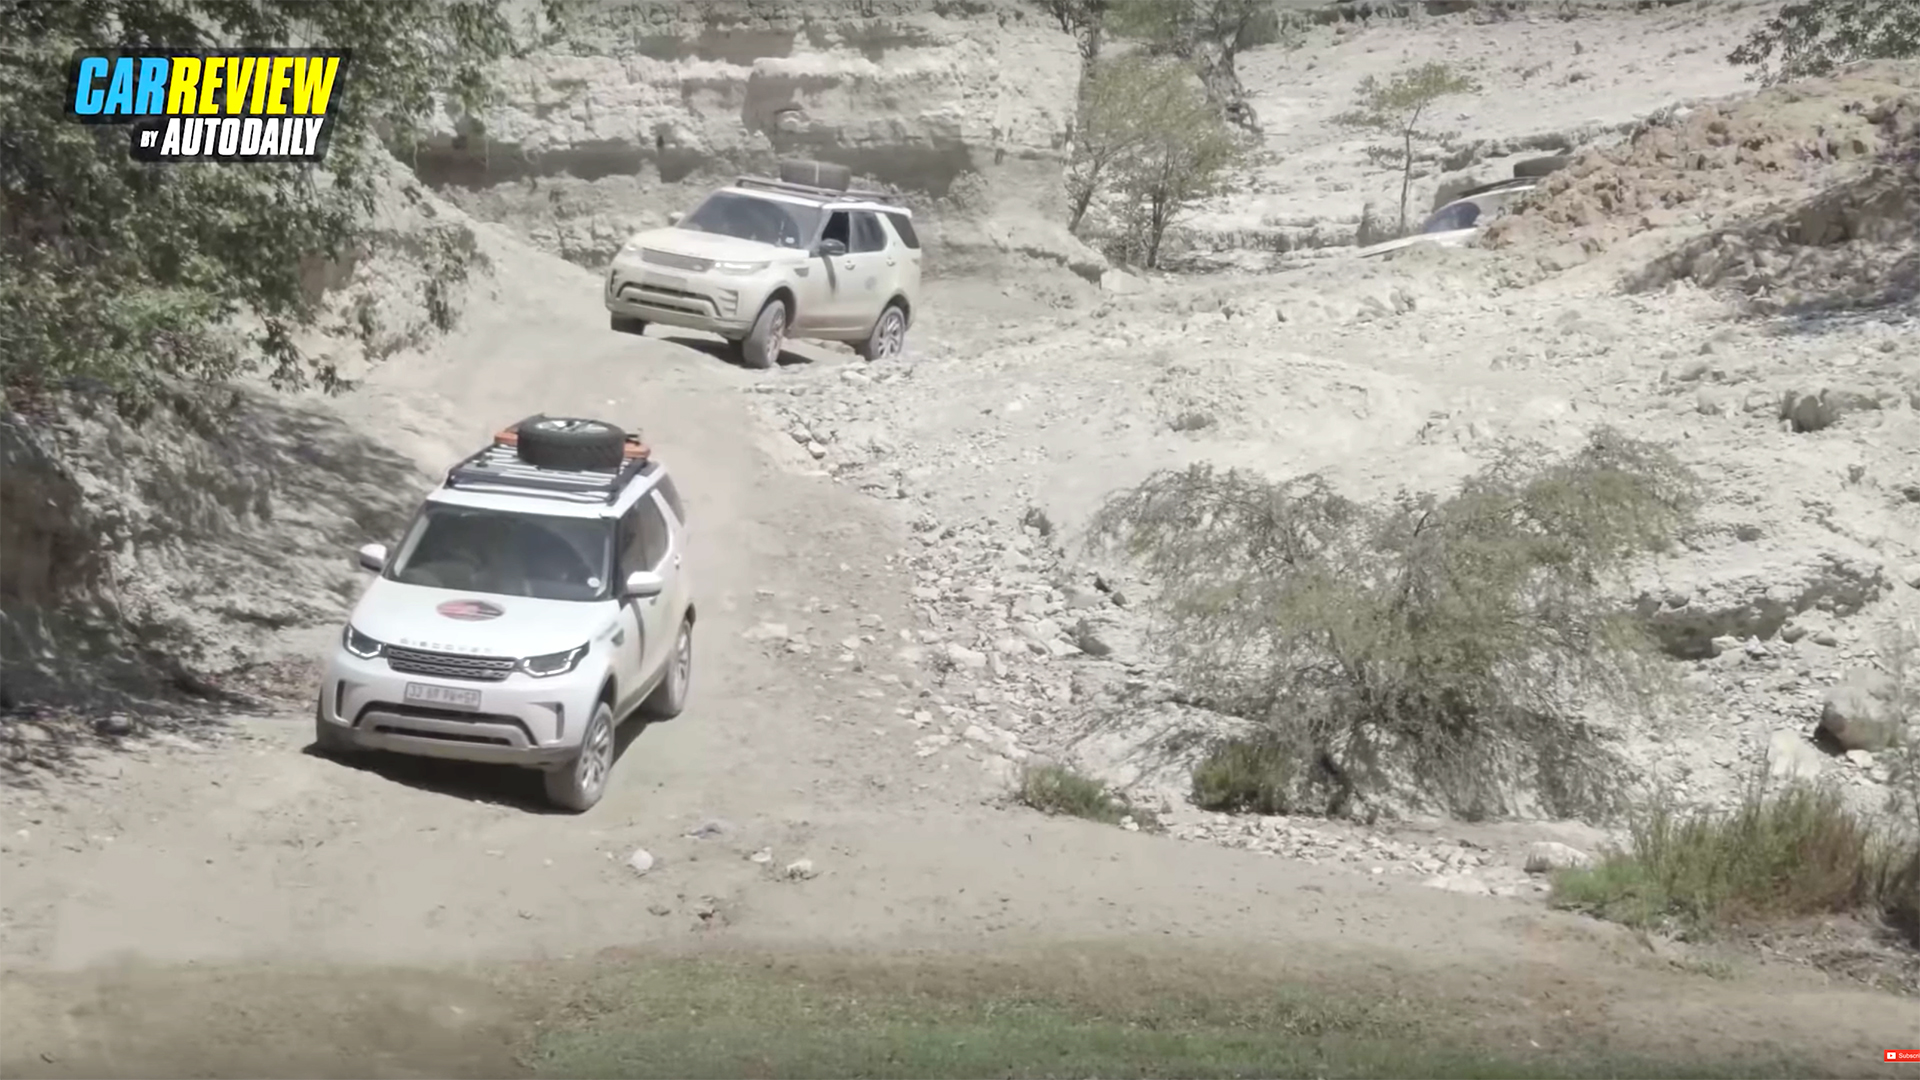 trail-to-namibia-p3-autodaily.jpg